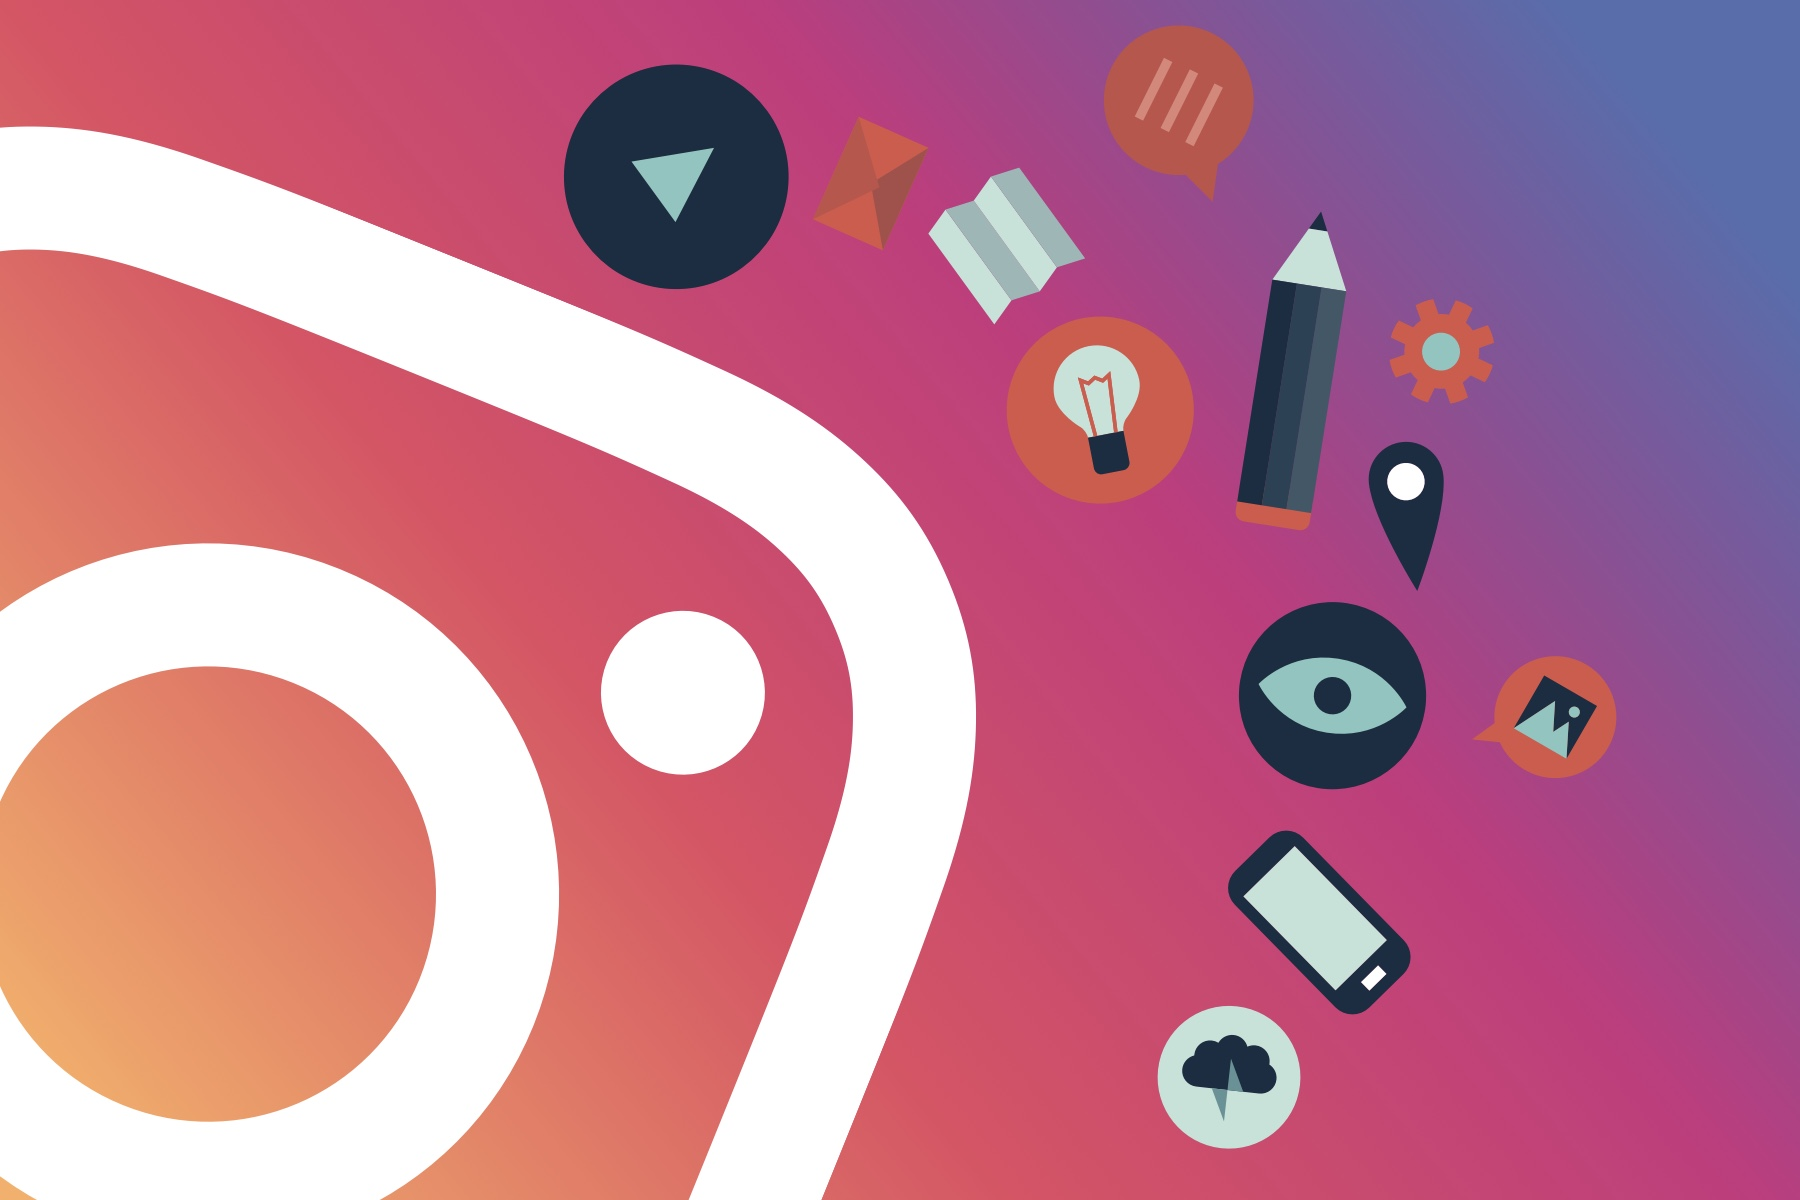 Instagram, Appnations, Appnations.com, News, Stop-Motion, GIF,Story,